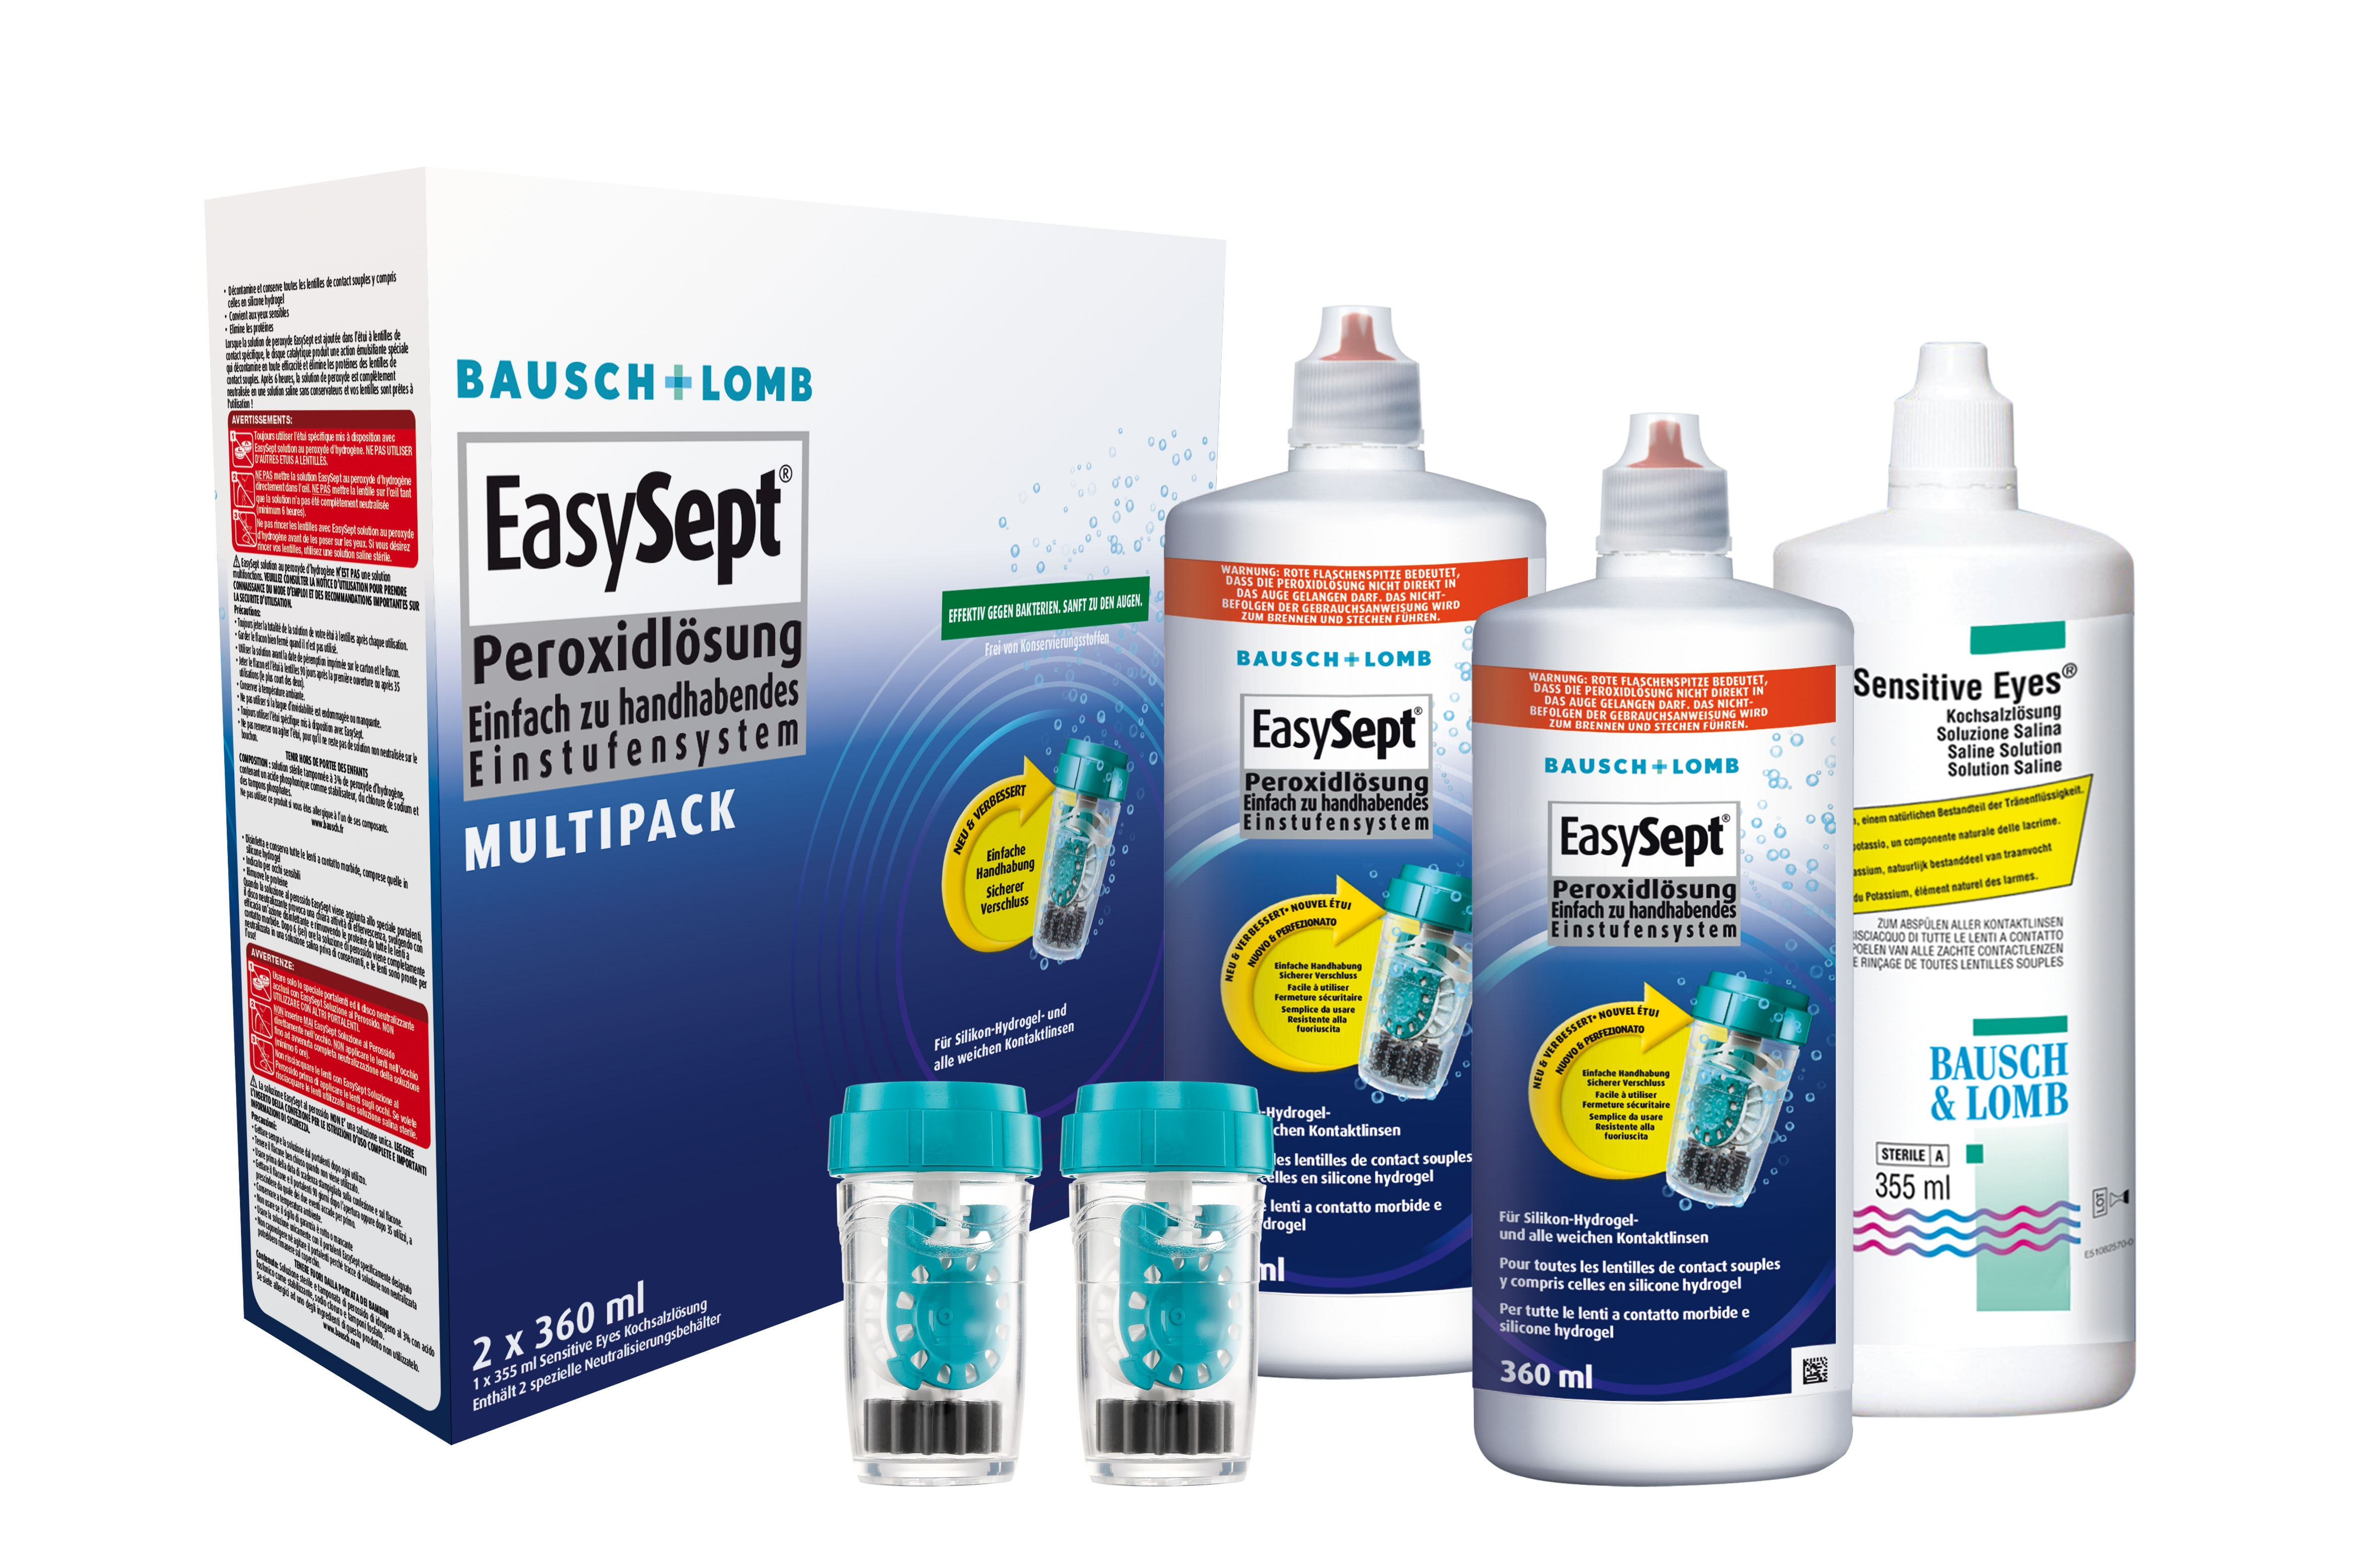 Bausch & Lomb EasySept Multipack (2 x 360ml + 355ml)